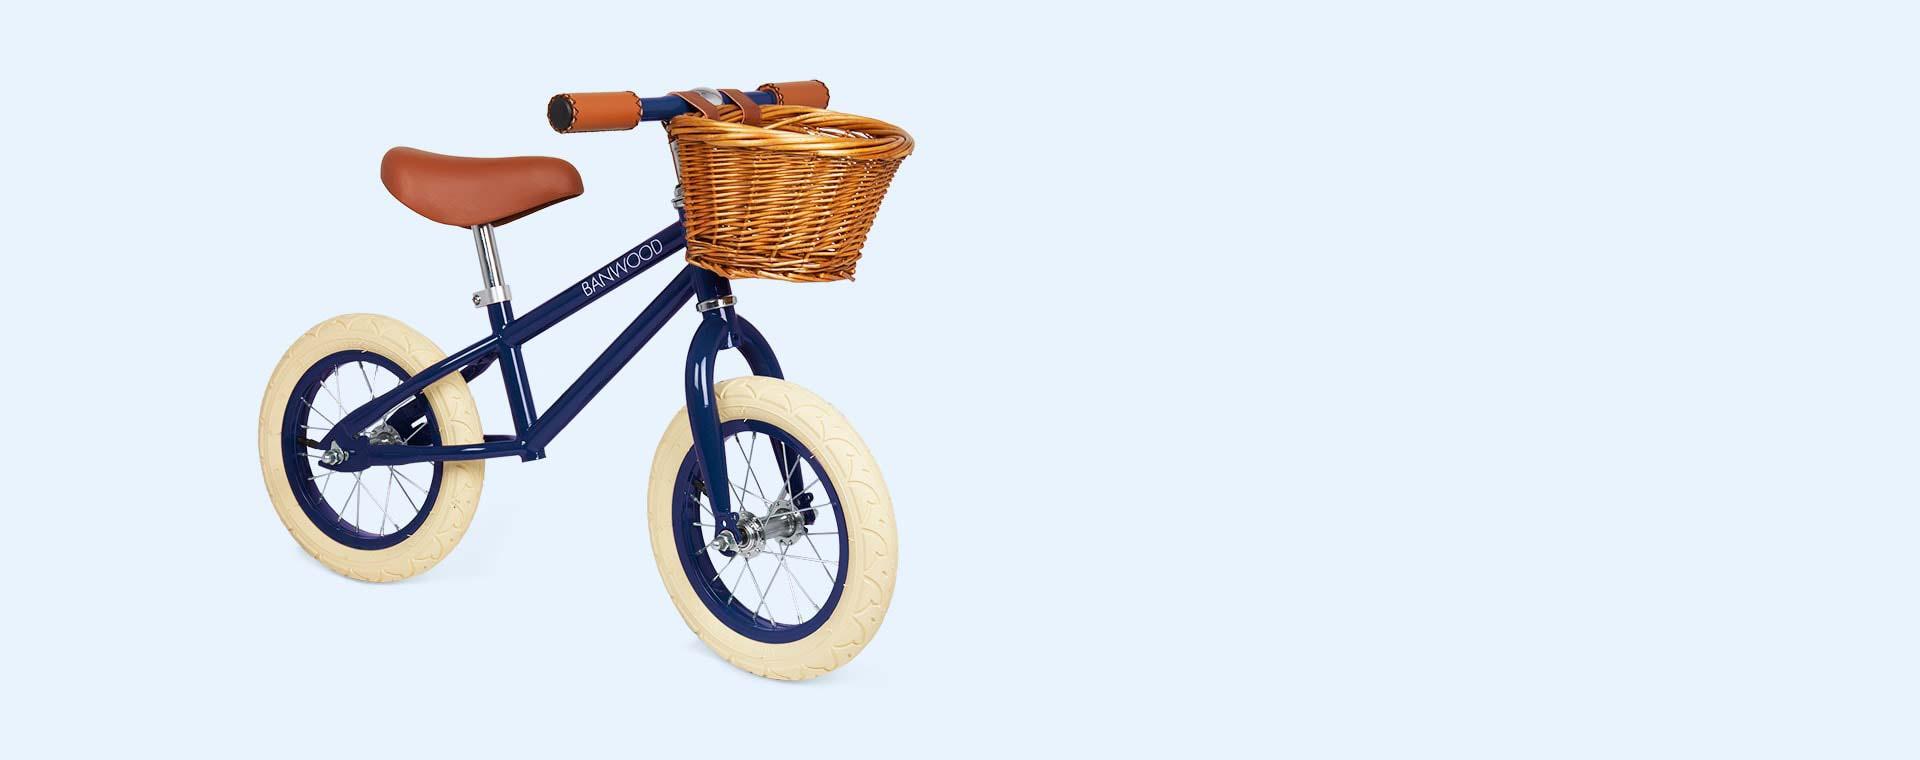 Navy Blue Banwood First Go Balance Bike